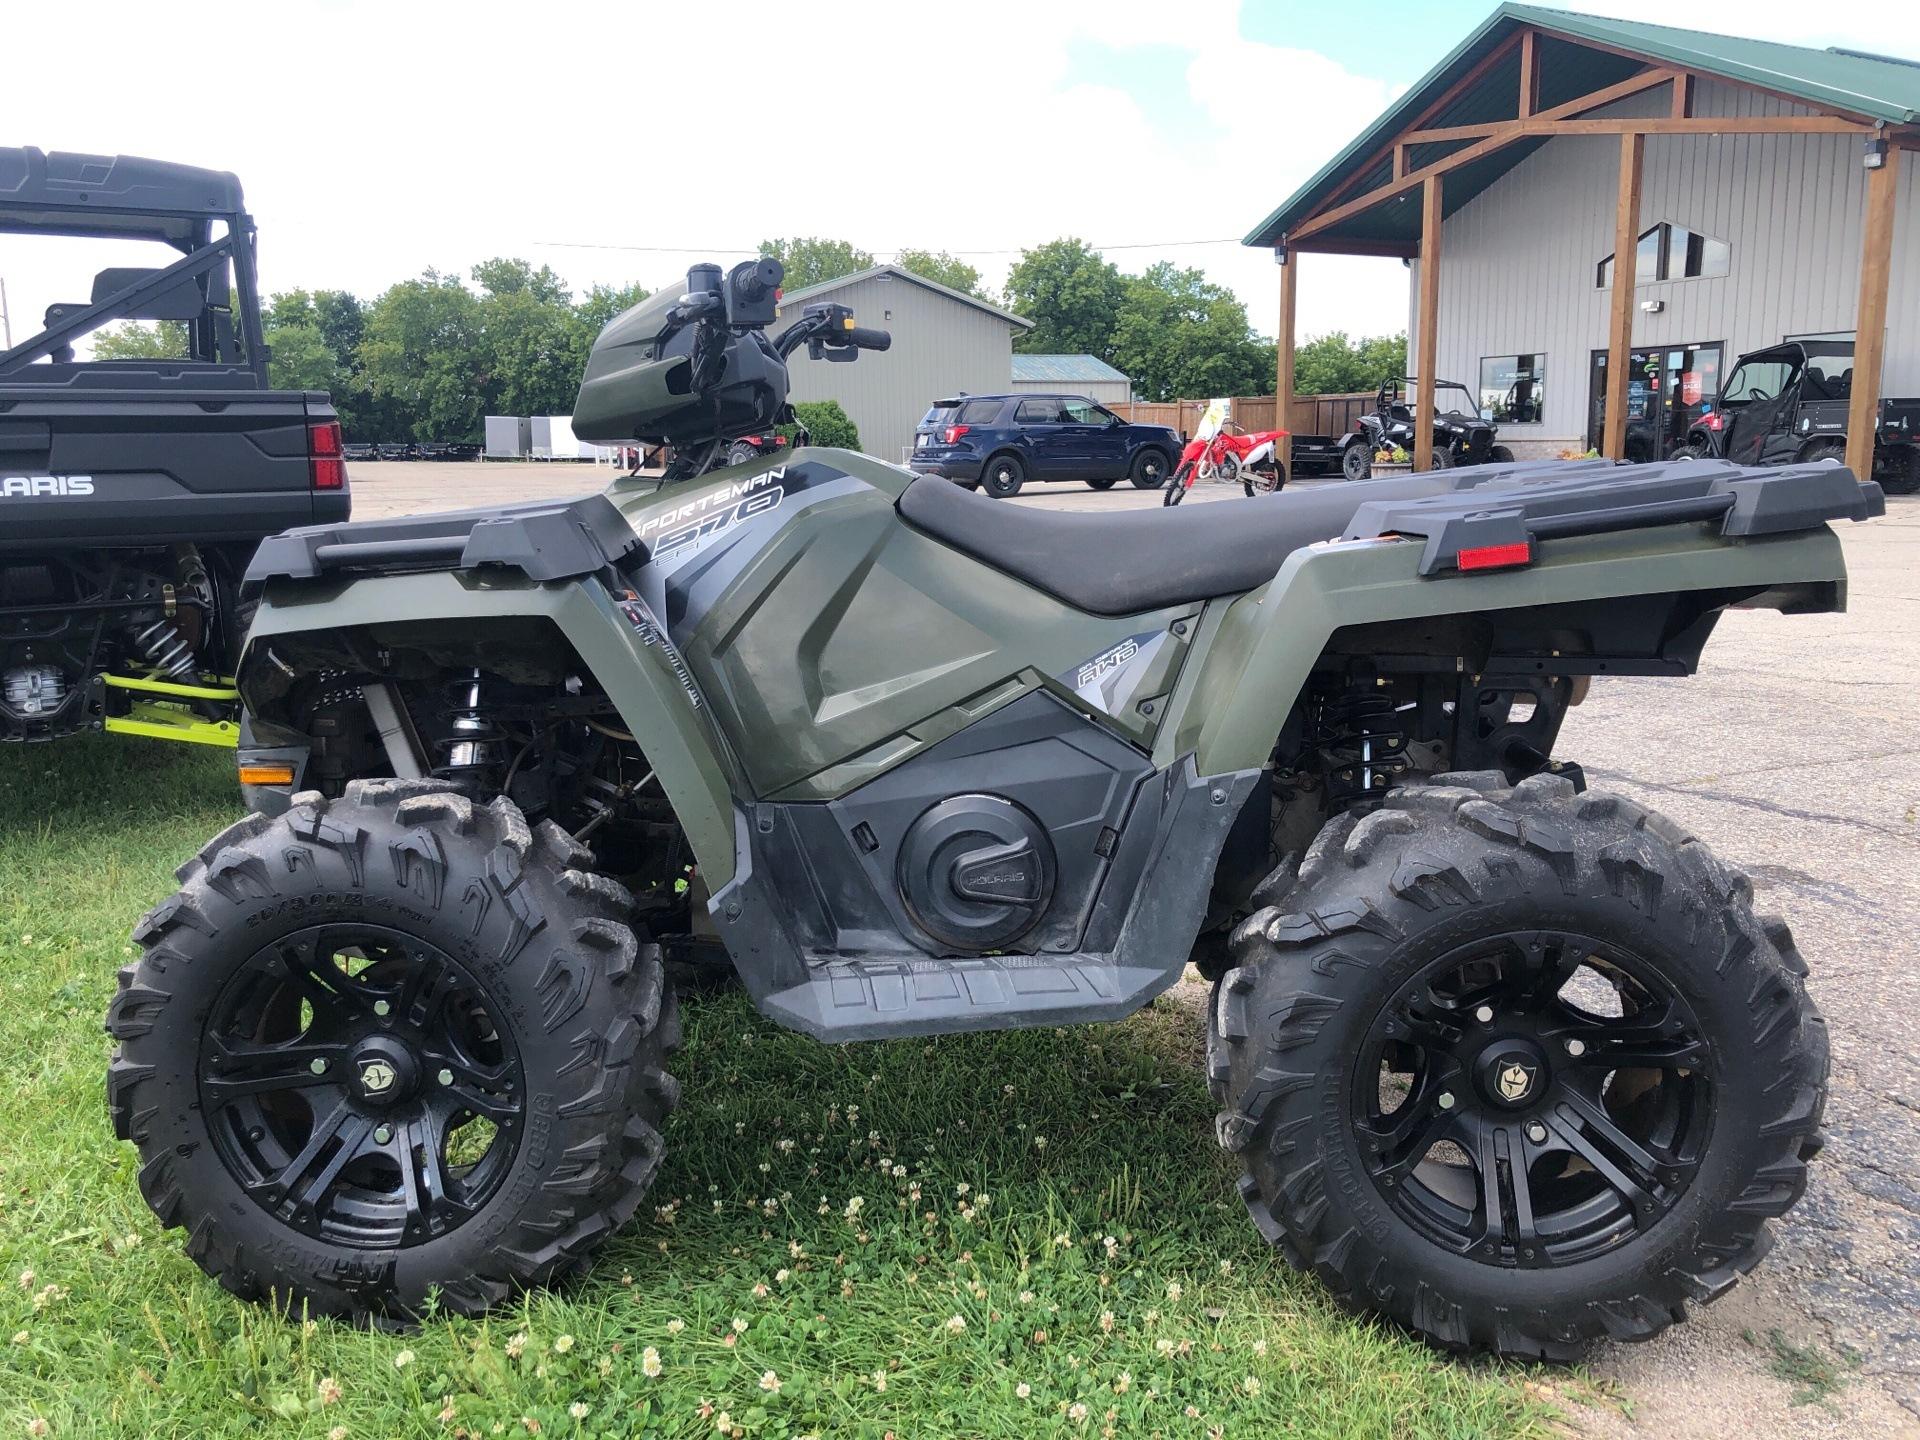 2019 Polaris Sportsman 570 in Elkhorn, Wisconsin